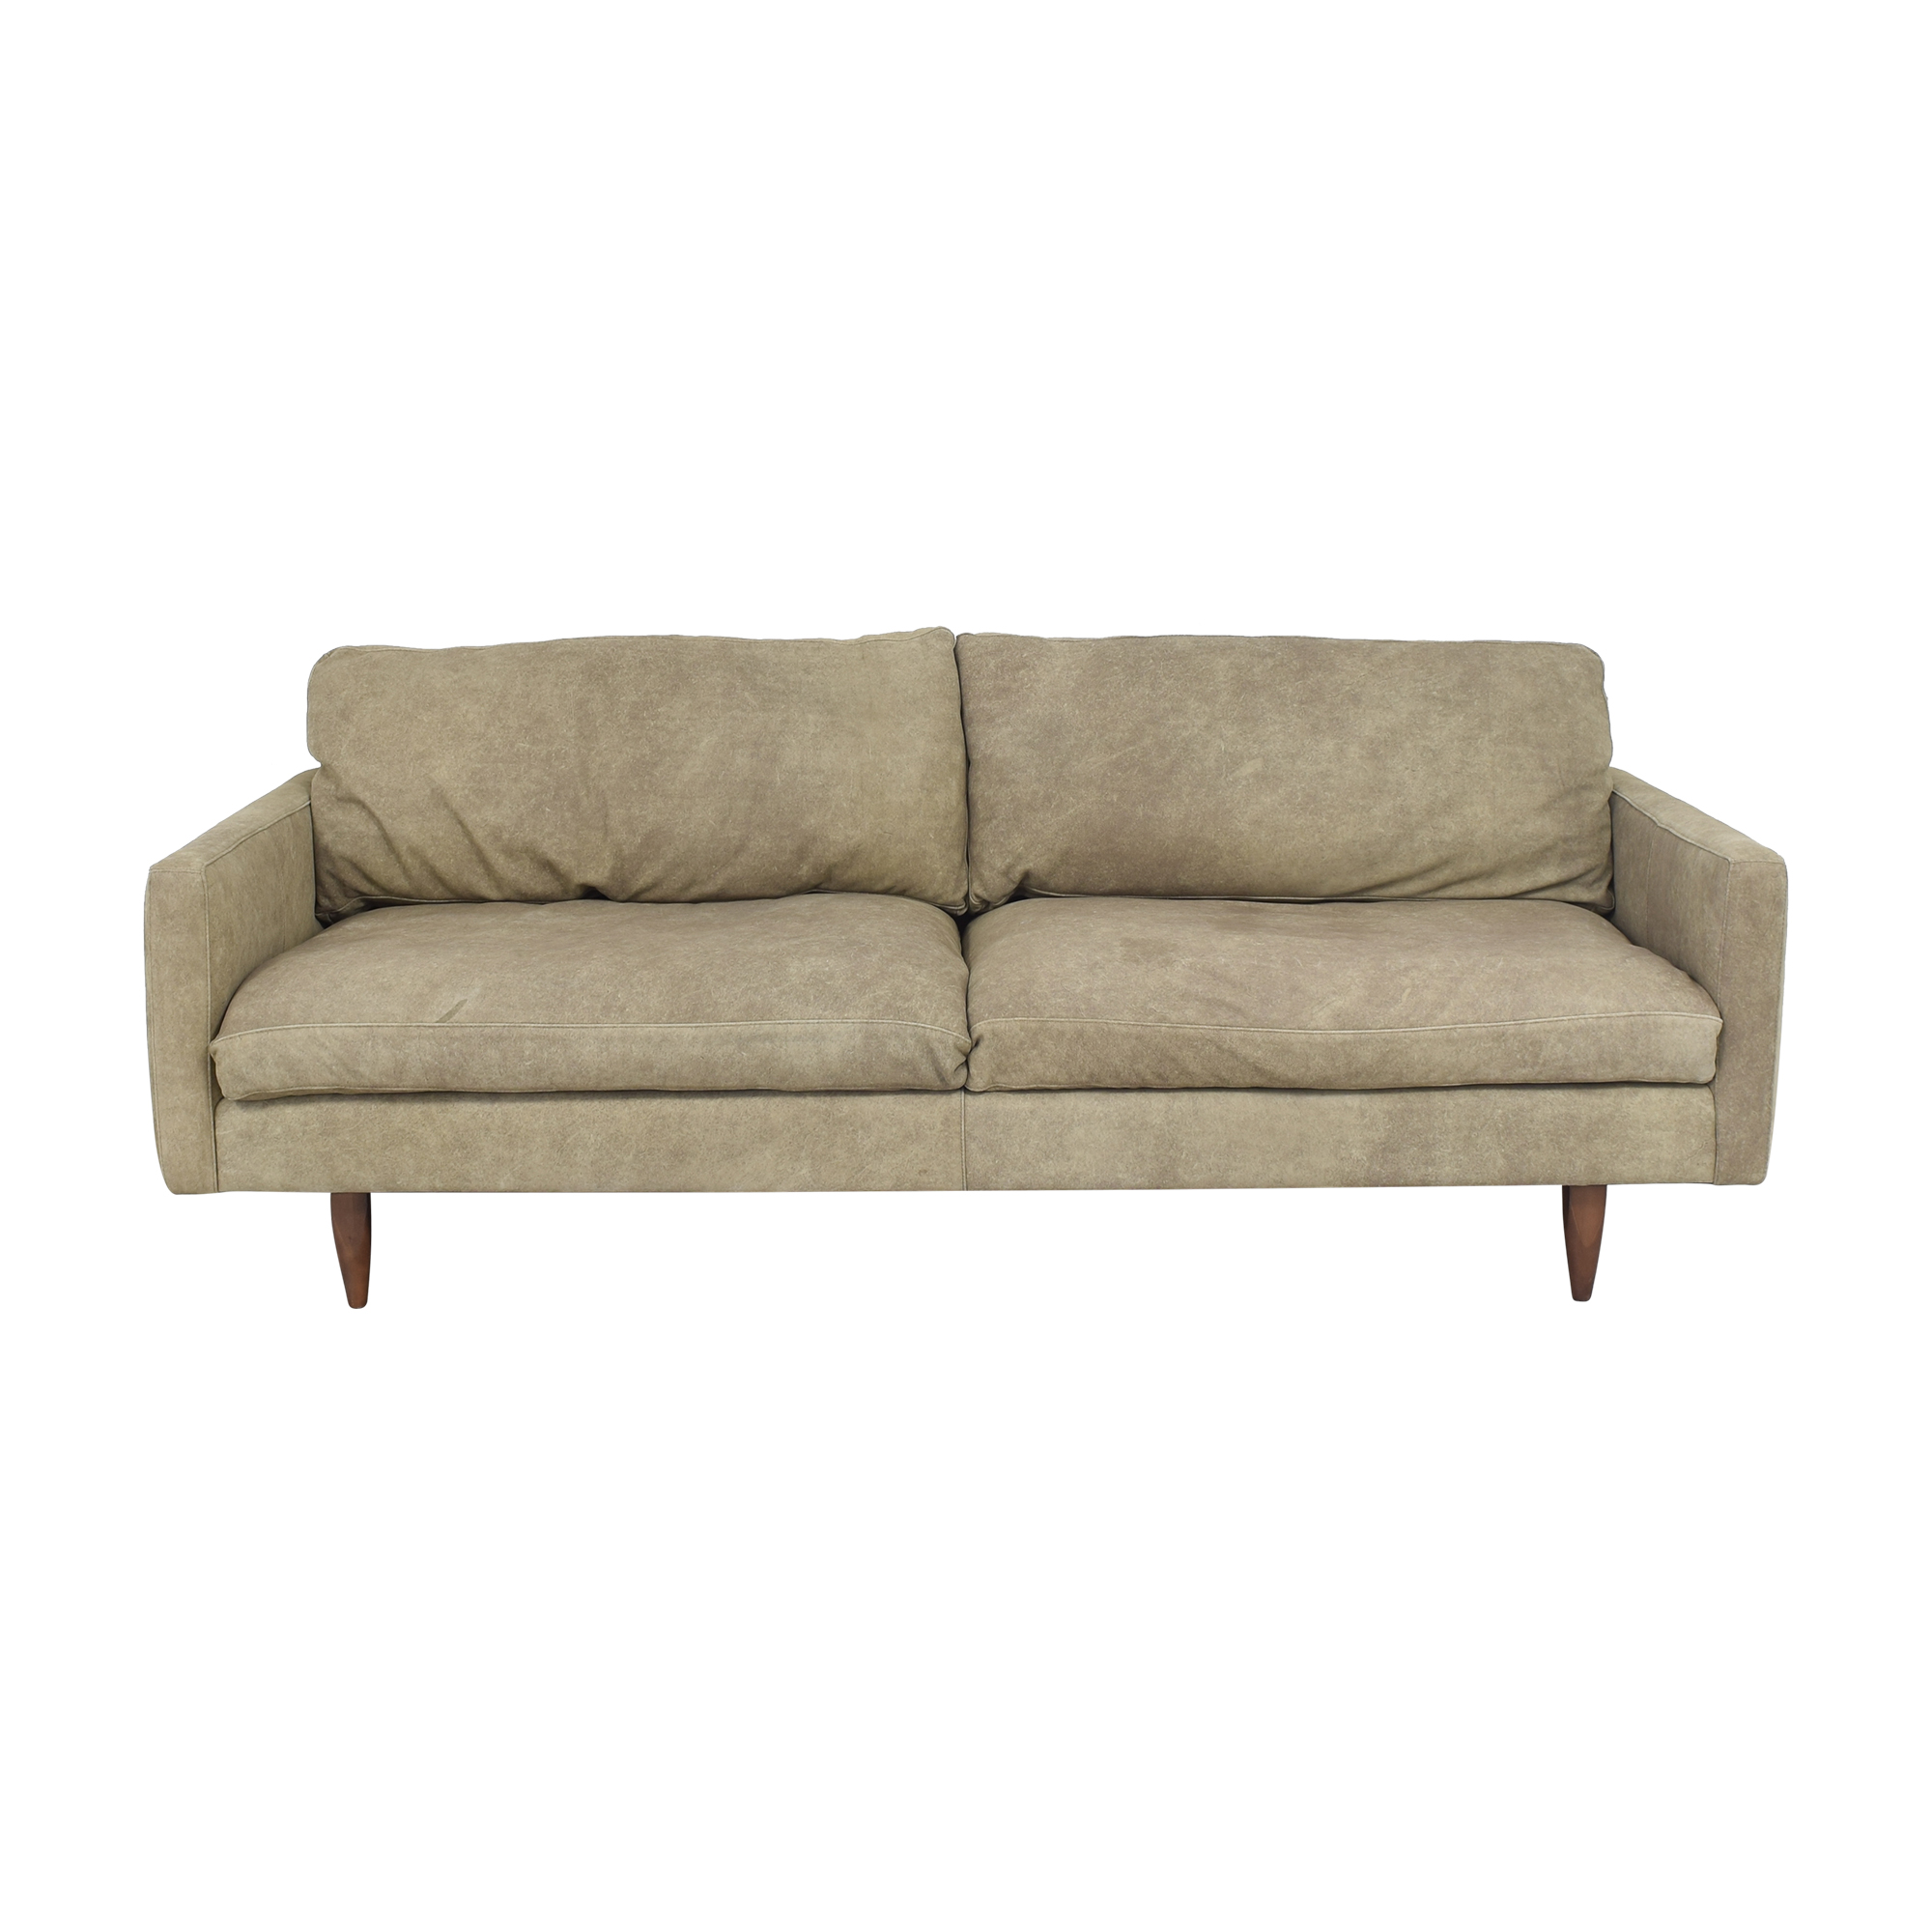 Room & Board Room & Board Jasper Two Cushion Sofa dimensions